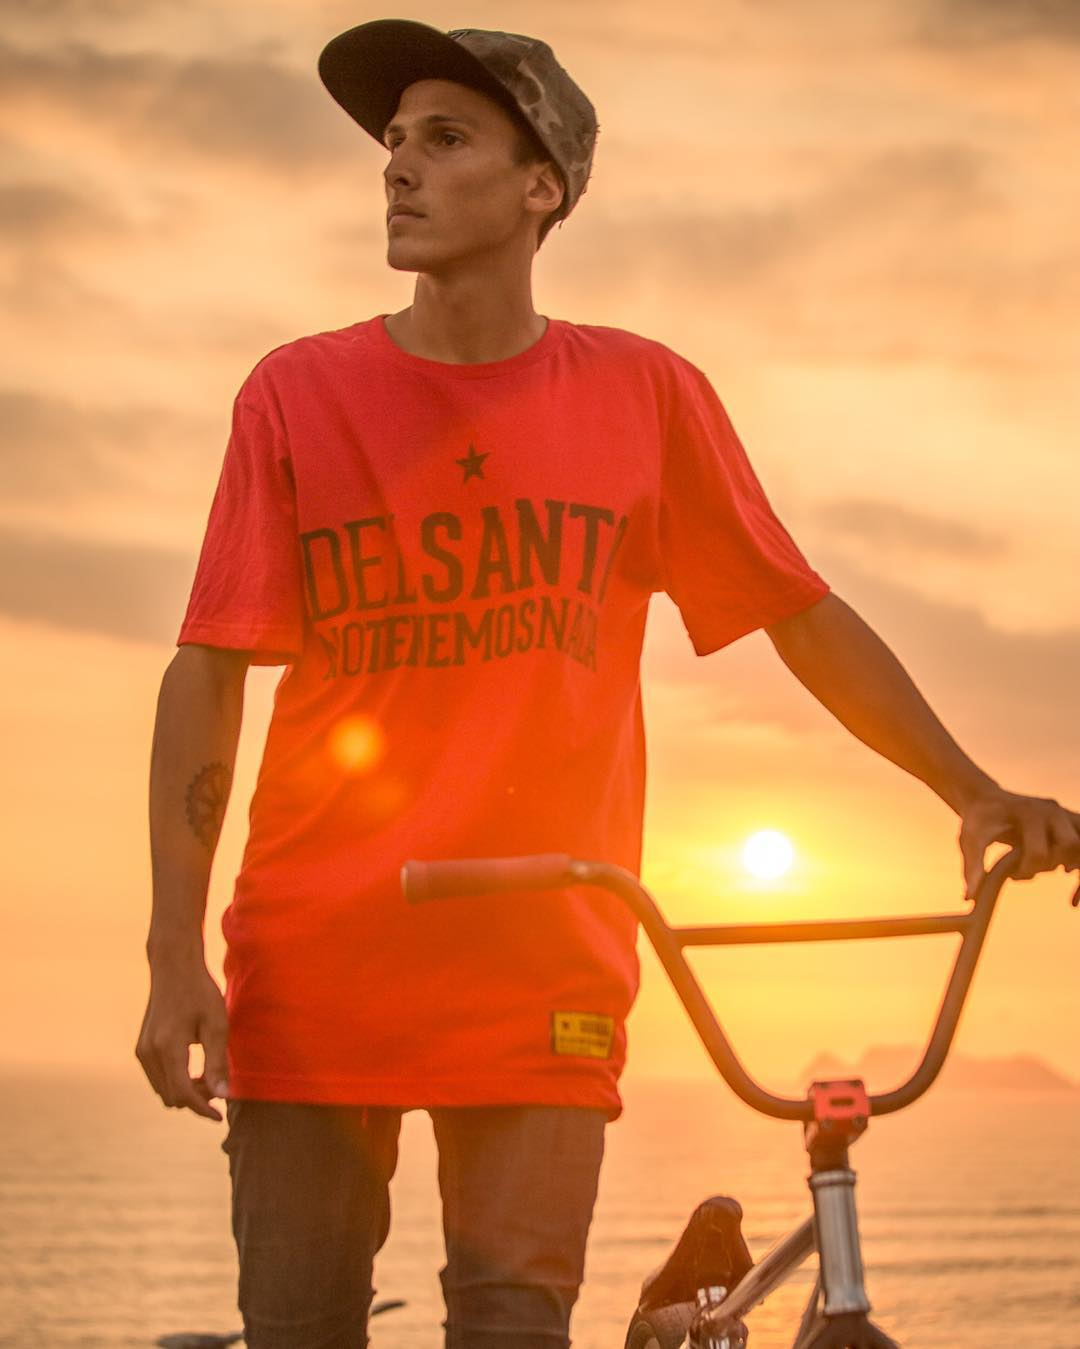 Raider @nicodelacosta  Fotografo @oscarpereiracadenas  Lugar #lima  @delsanto_  @delsantofamily @delsantoteam  #bmx  #team #brand #family #clothing  #peru